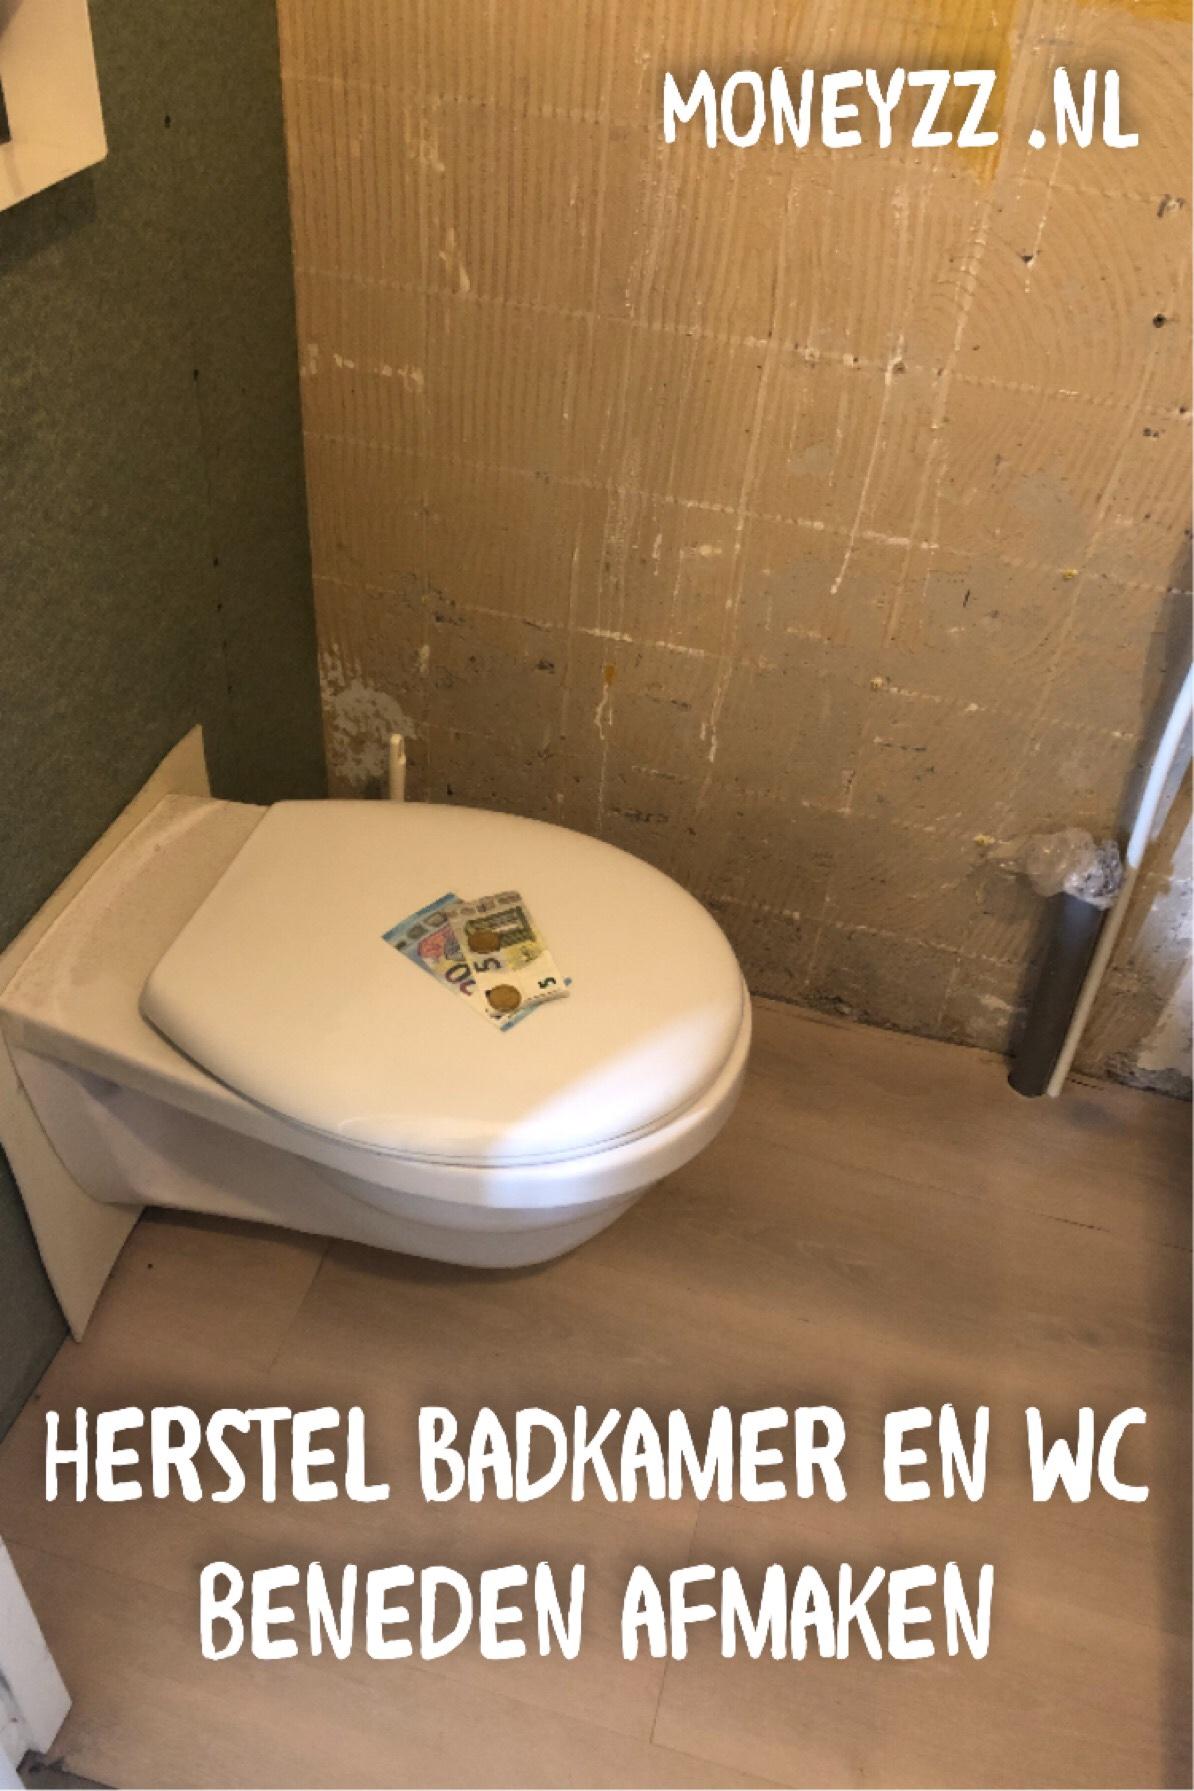 Herstel badkamer en wc beneden afmaken